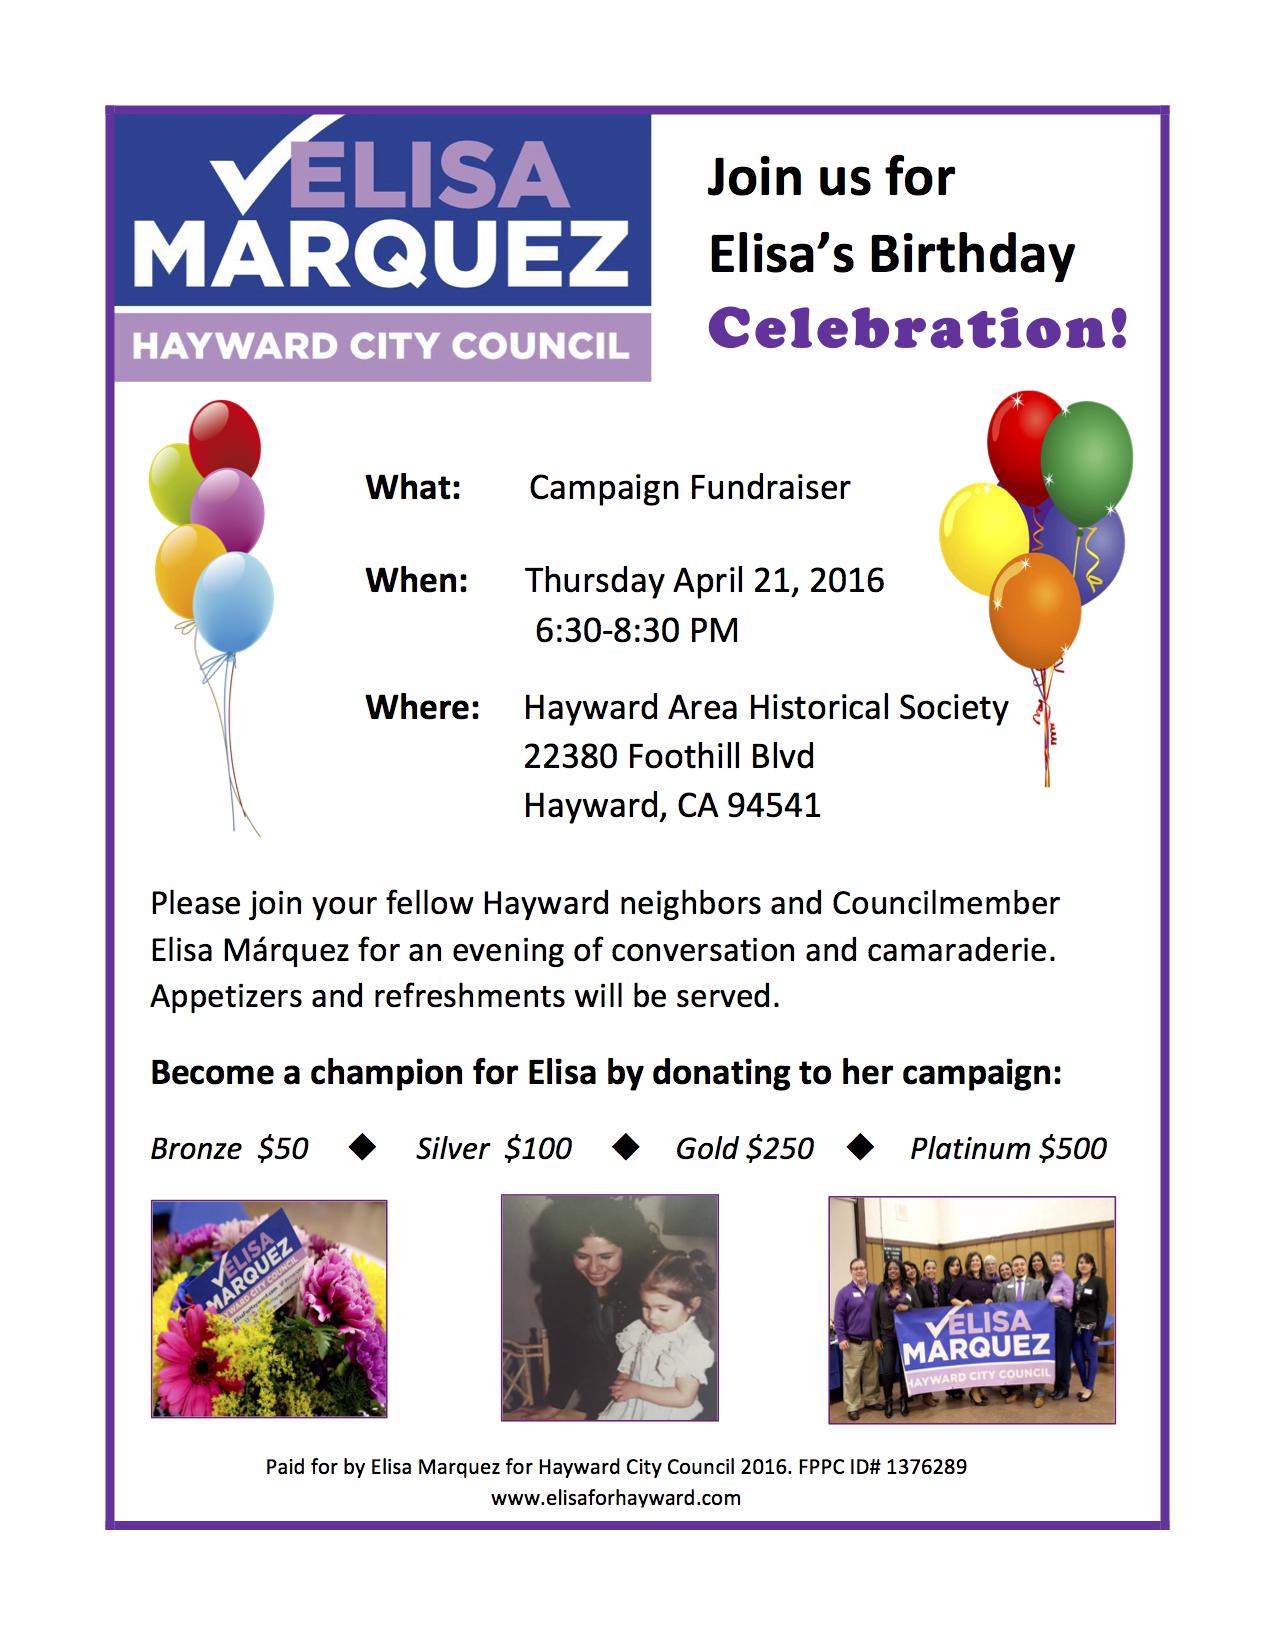 ElisaMarquez_Bday_Fundraiser_FF.png